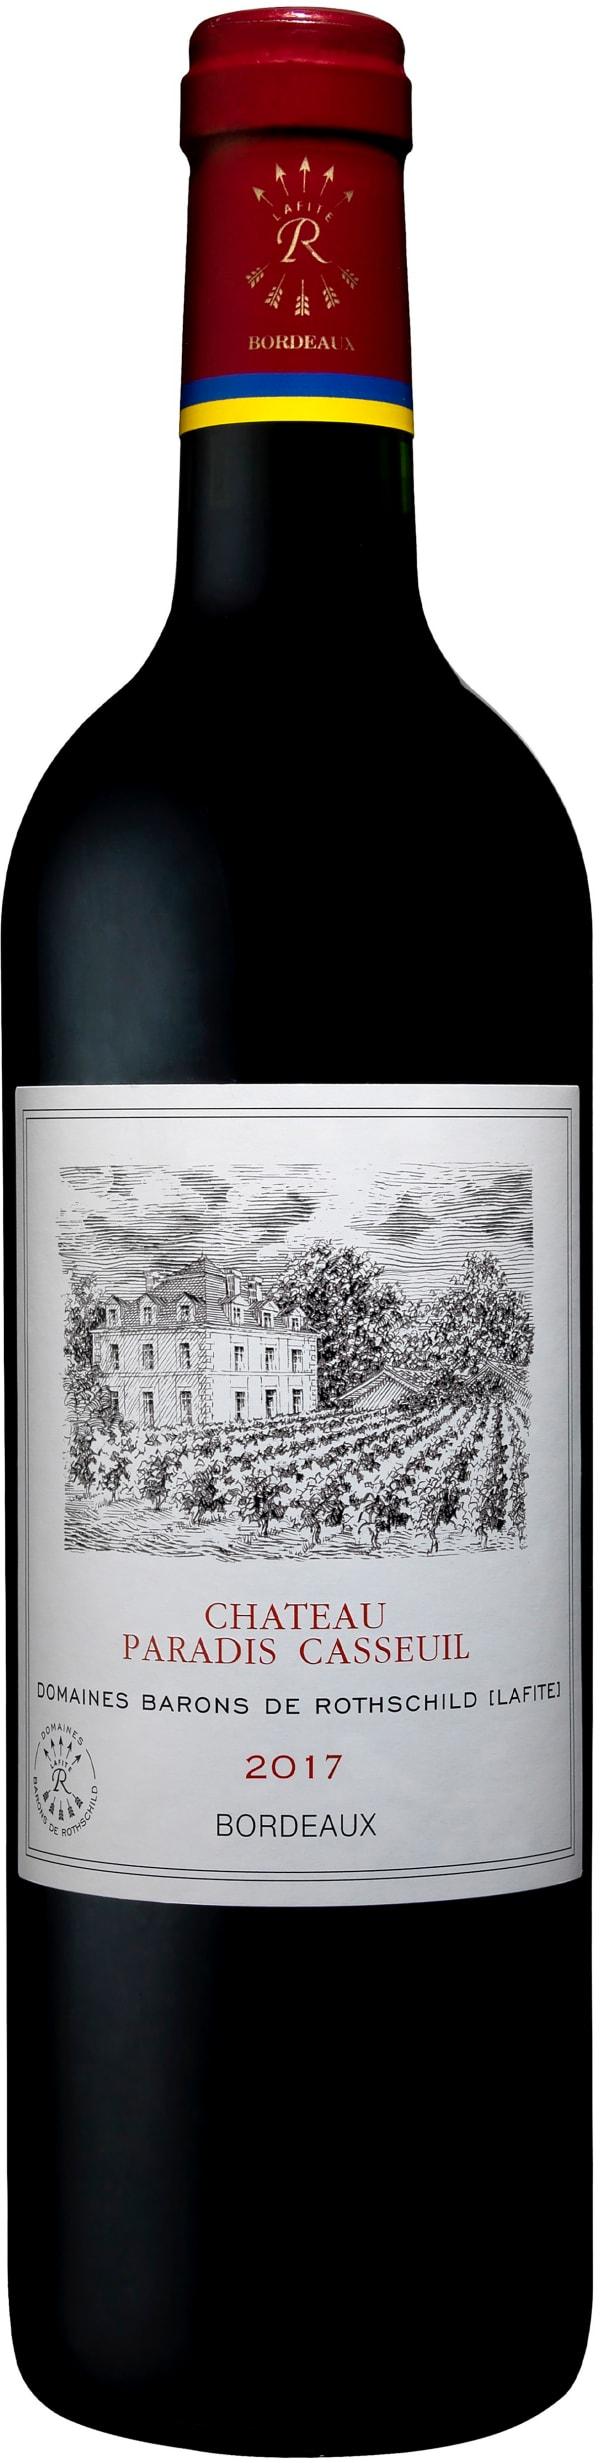 Château Paradis Casseuil 2017